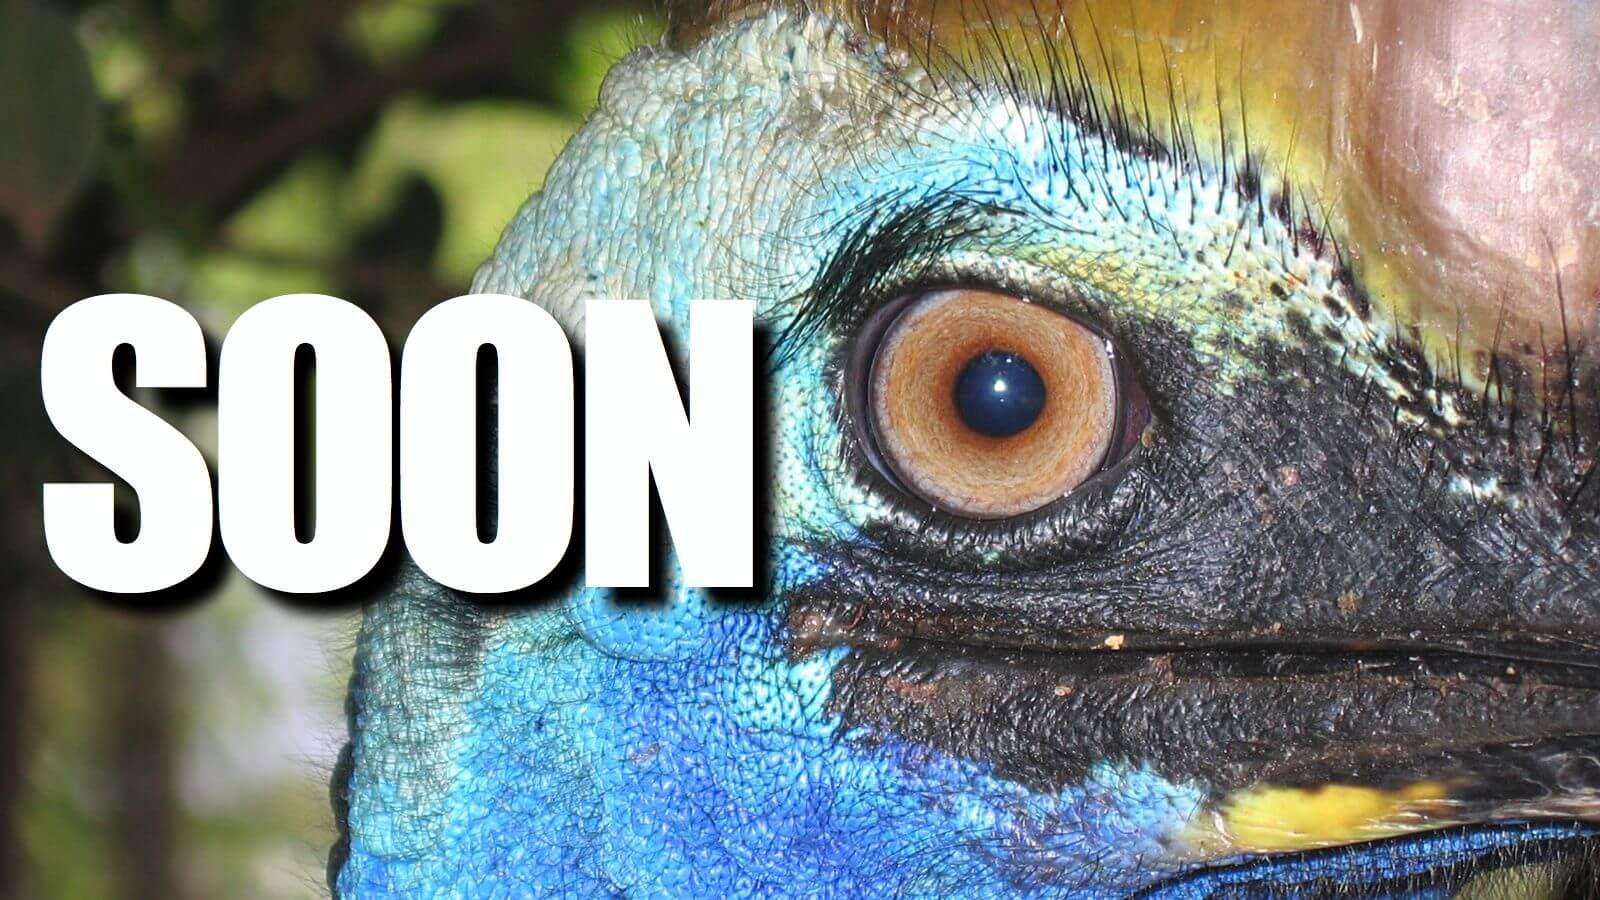 cassowary-soon